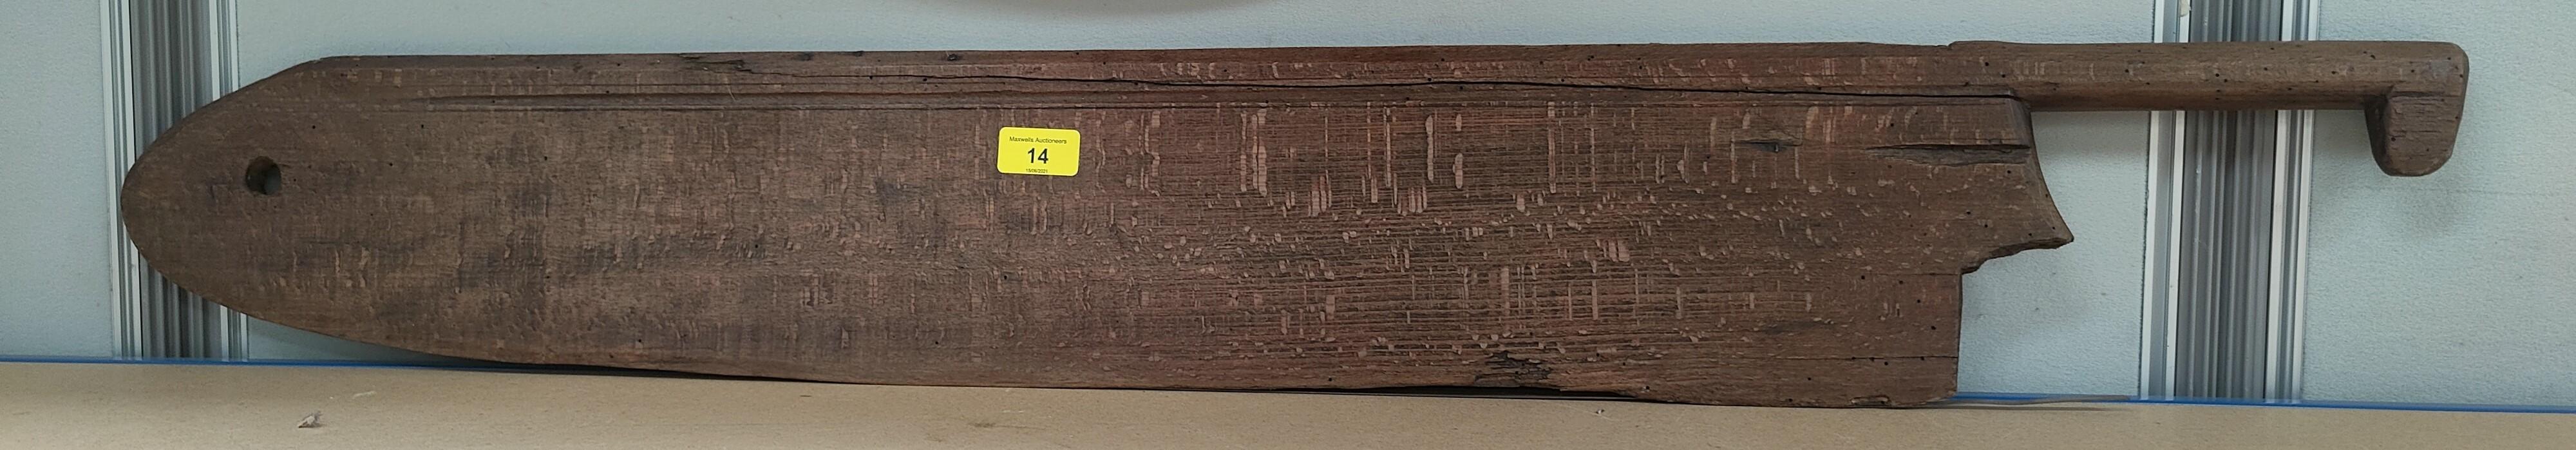 An antique wooden farmer's wheat shearing tool